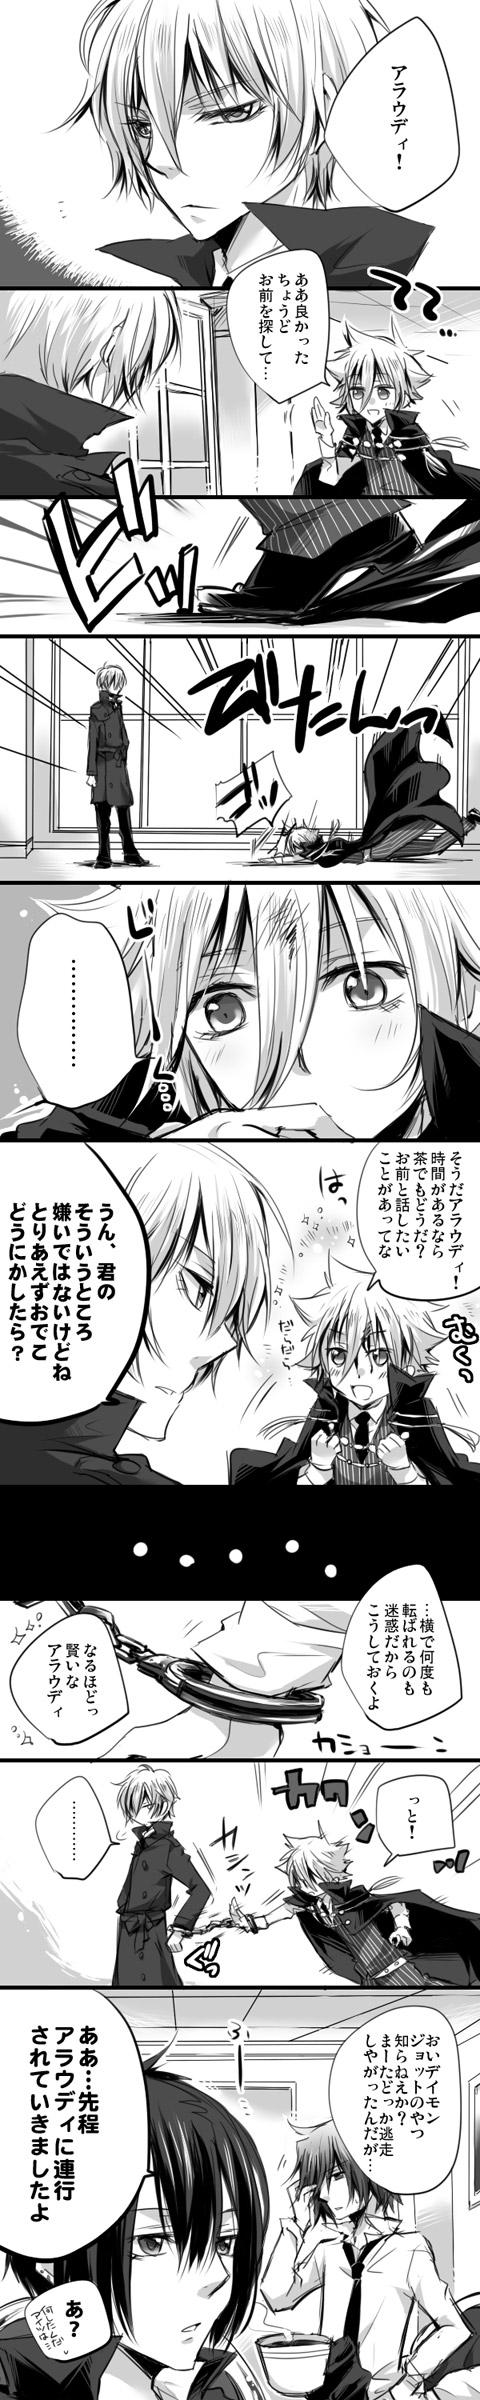 Tags: Anime, Buosu, Katekyo Hitman REBORN!, Alaude, Demon Spade, G., Vongola Primo Giotto, Comic, Translation Request, Pixiv